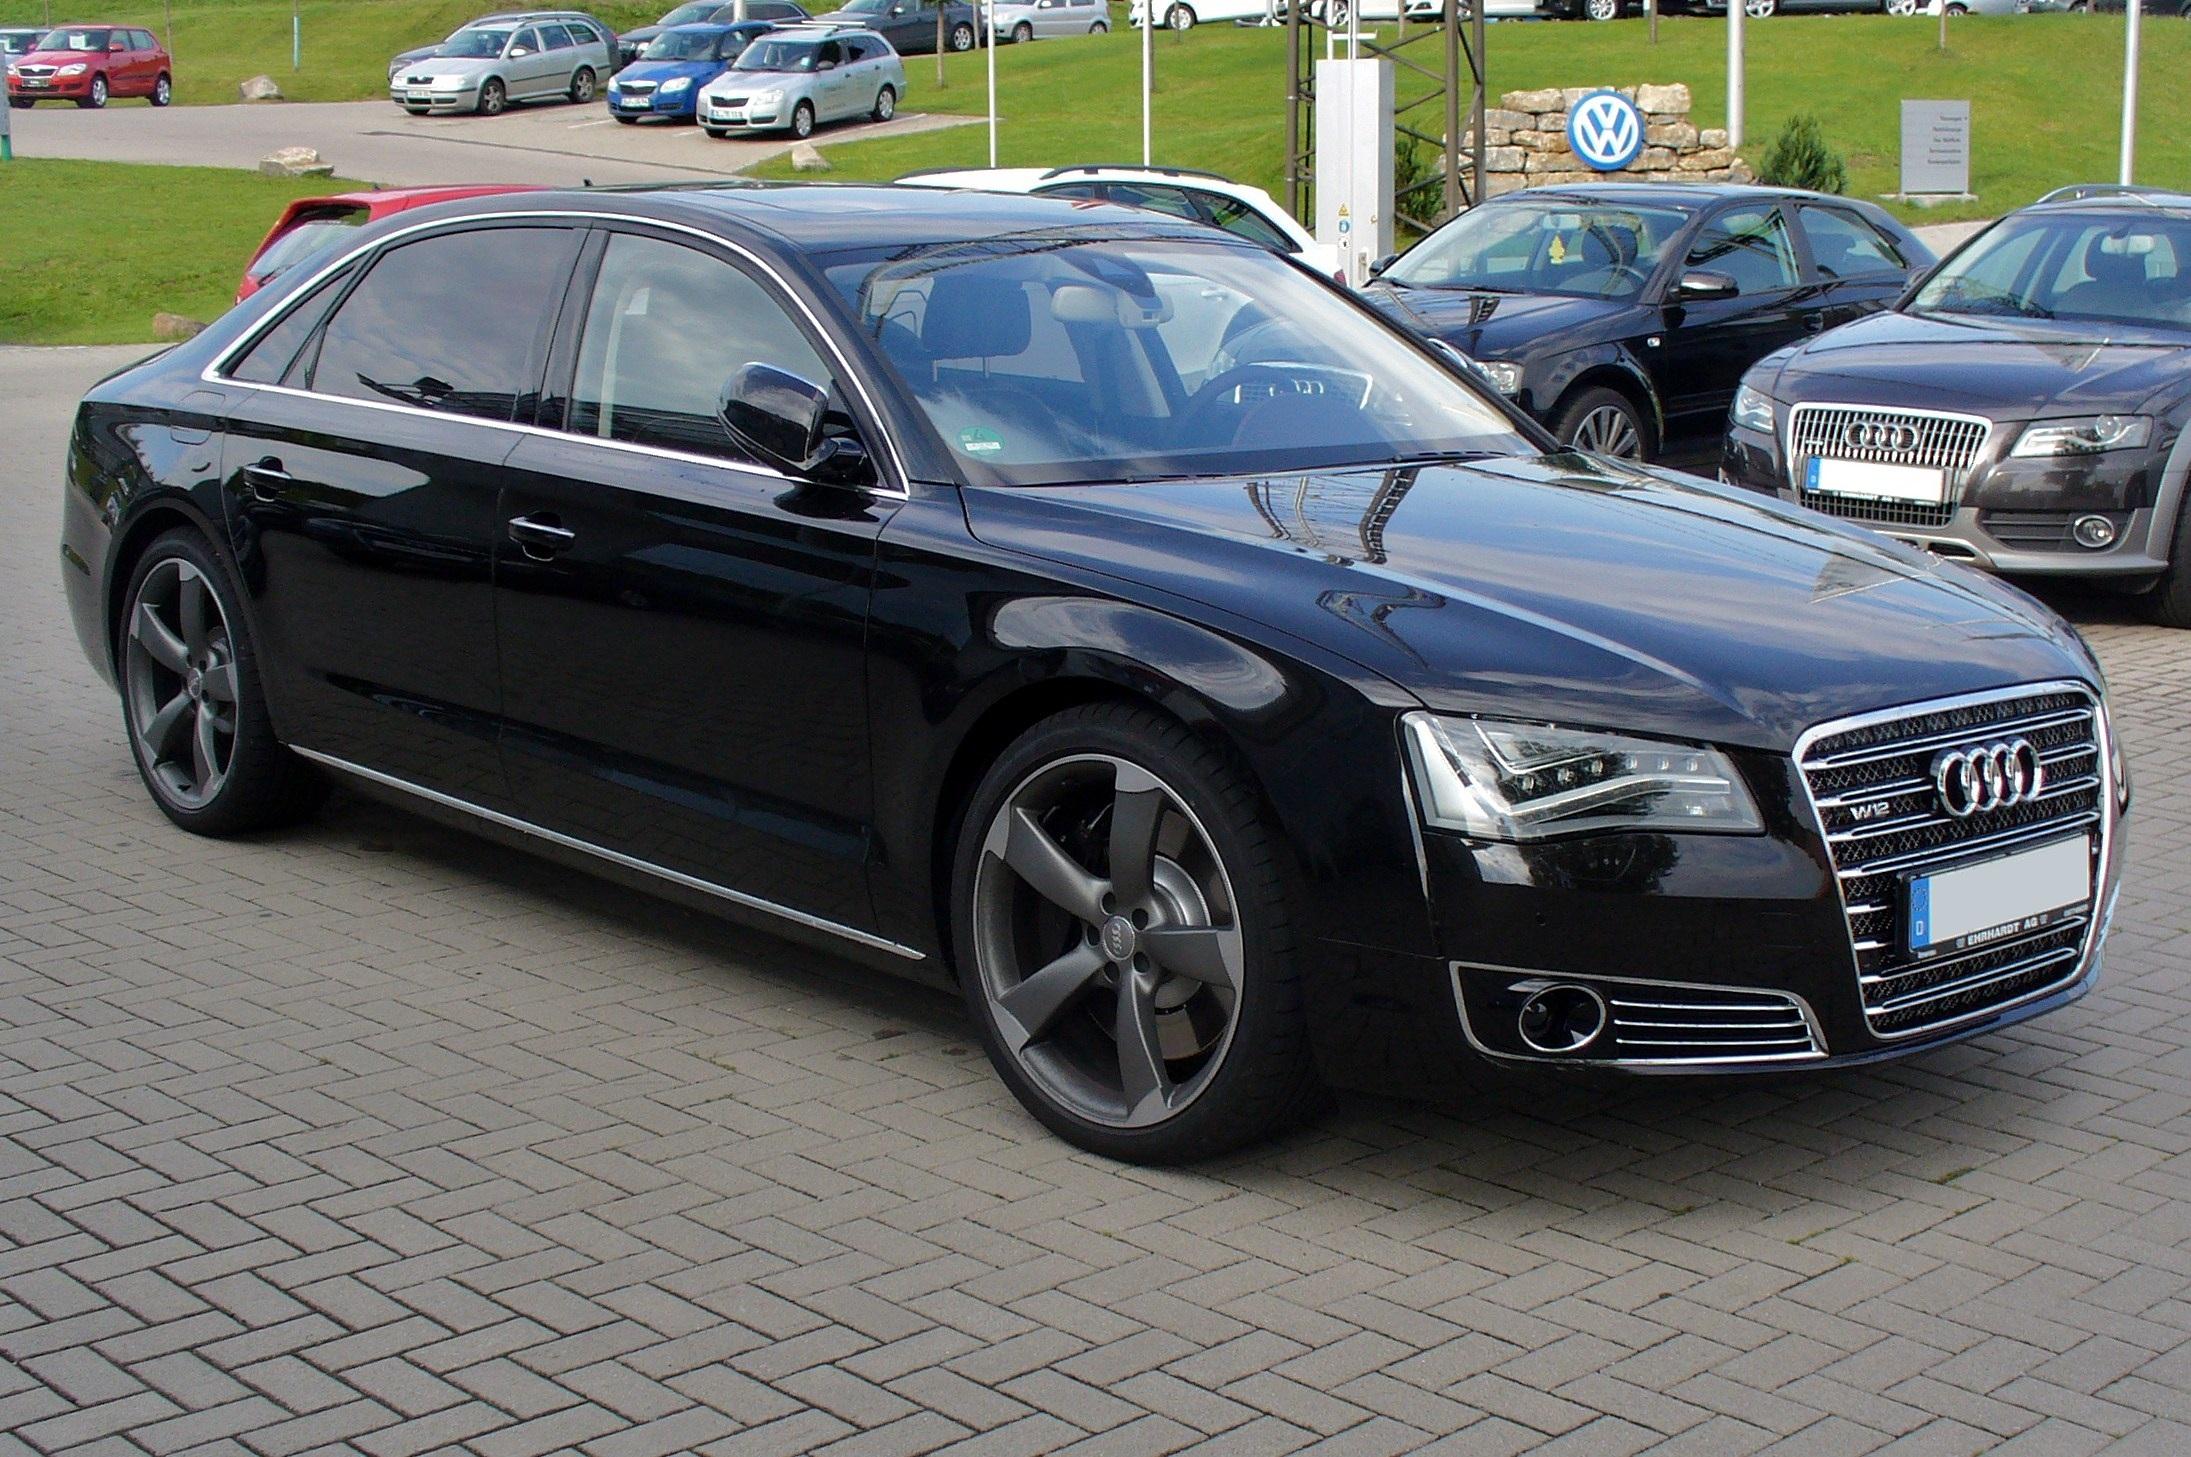 Audi_A8_L_W12_quattro_tiptronic_Phantomschwarz.JPG